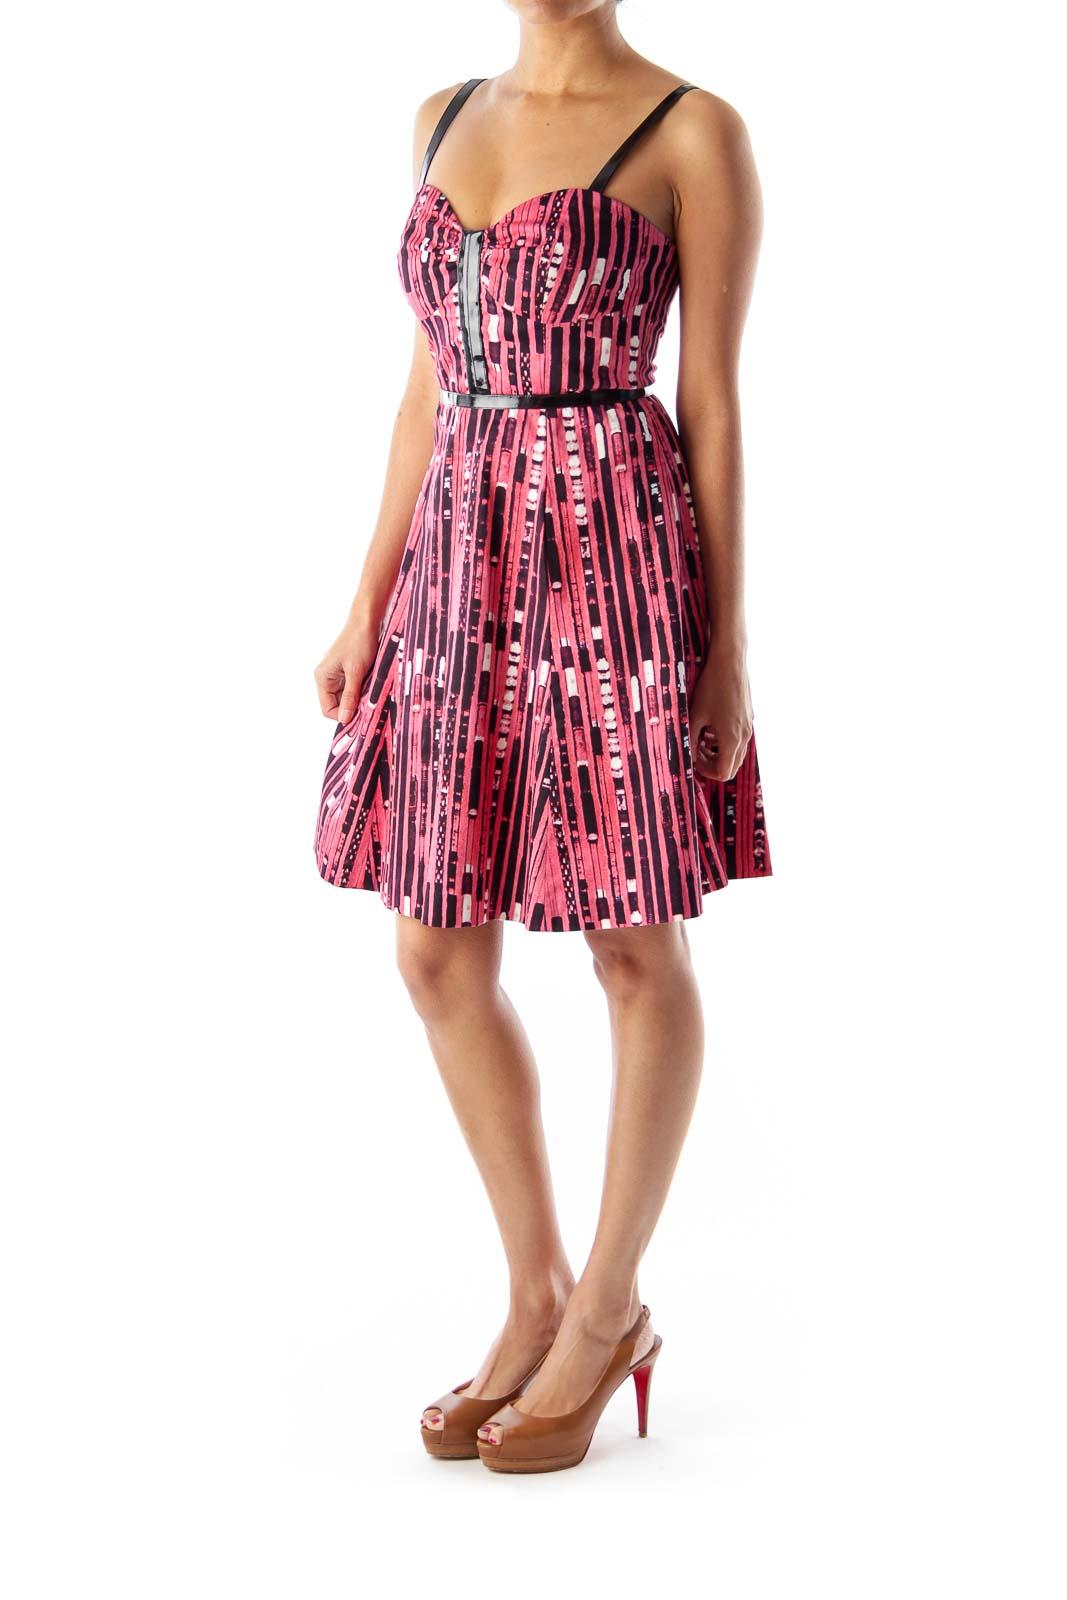 Pink & Black Print Dress